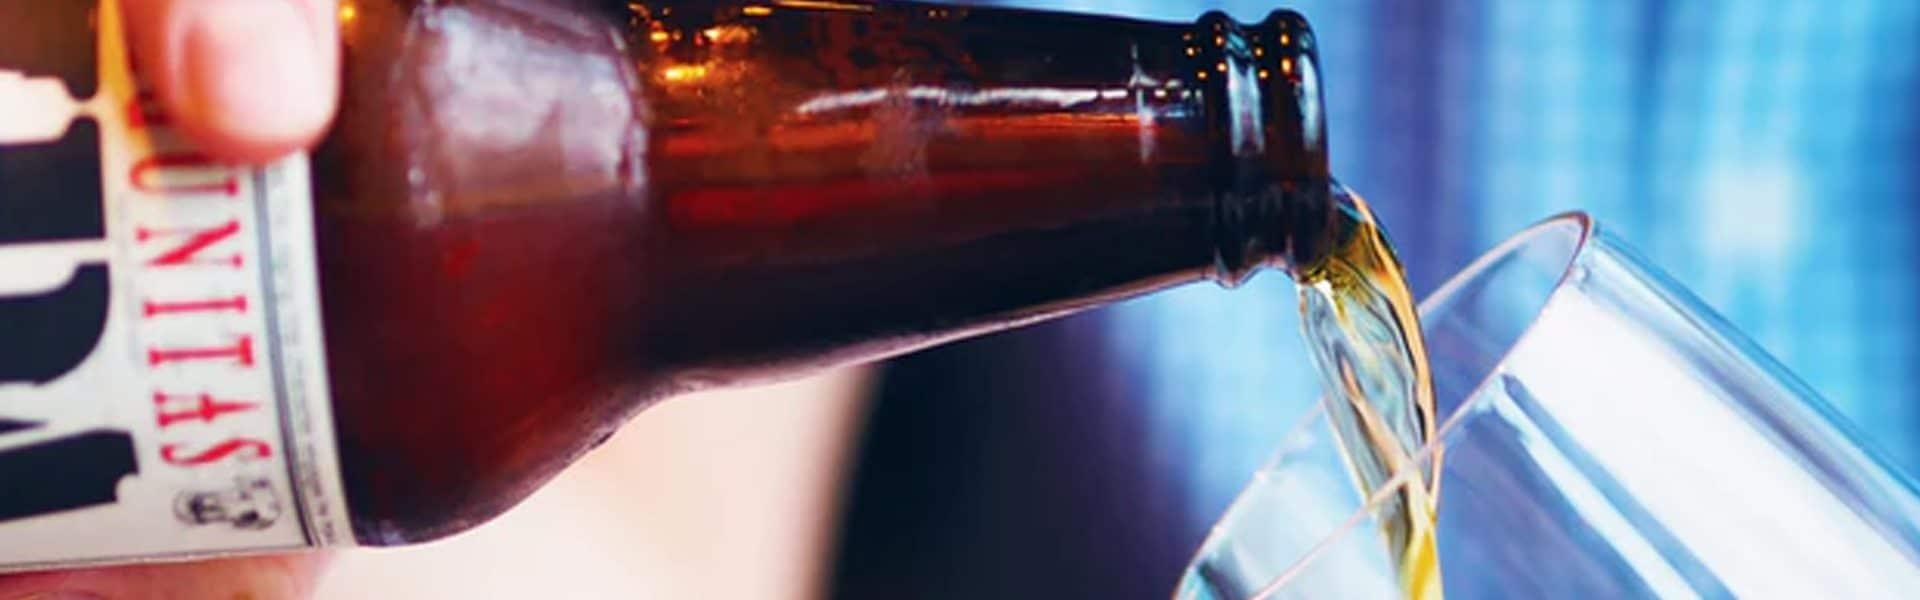 kit cervejeiro